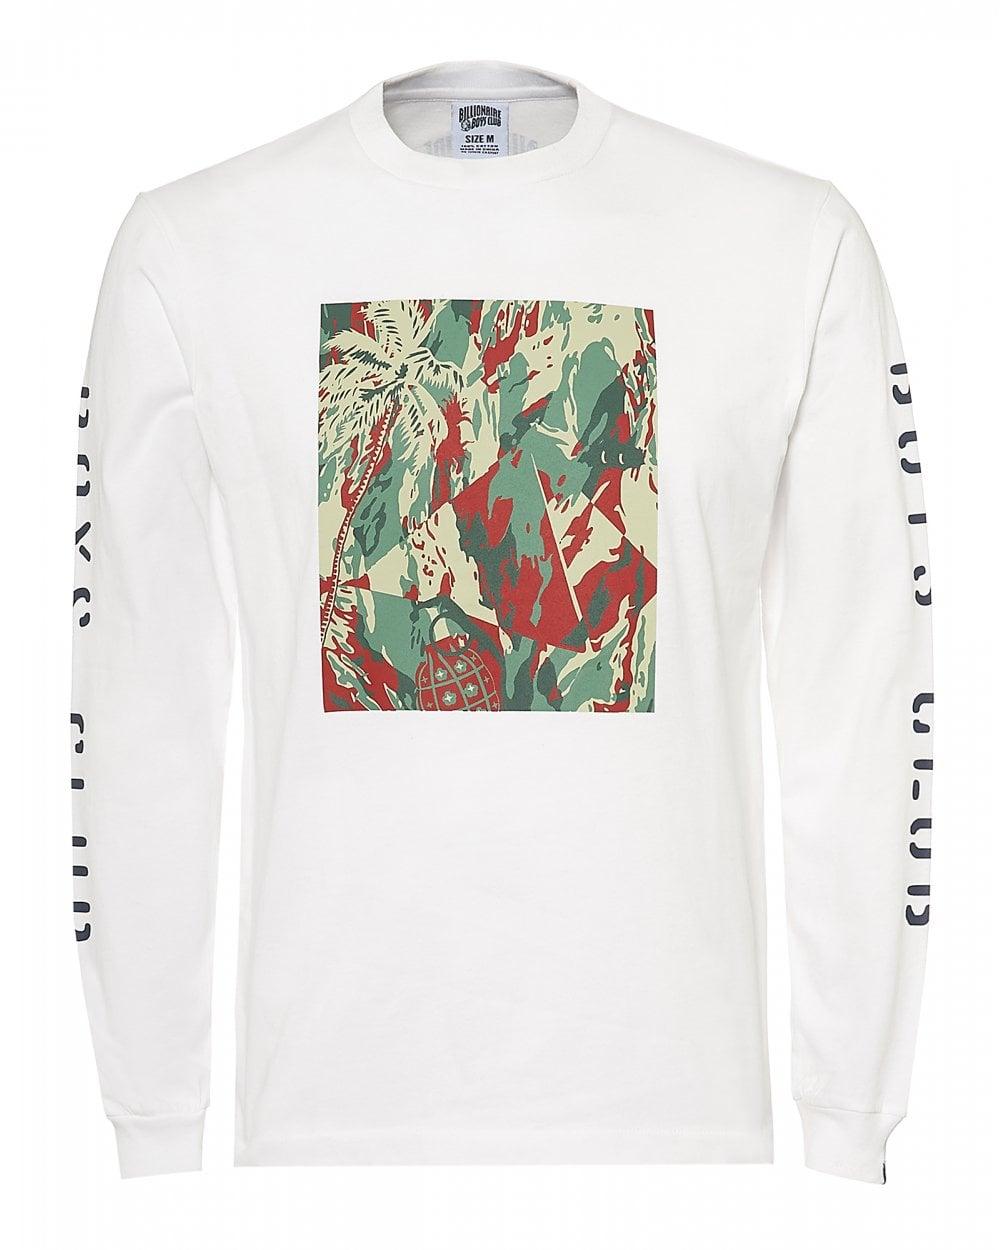 4d0f8386 Billionaire Boys Club Mens Lizard Camo Tile T-Shirt, Long Sleeve ...